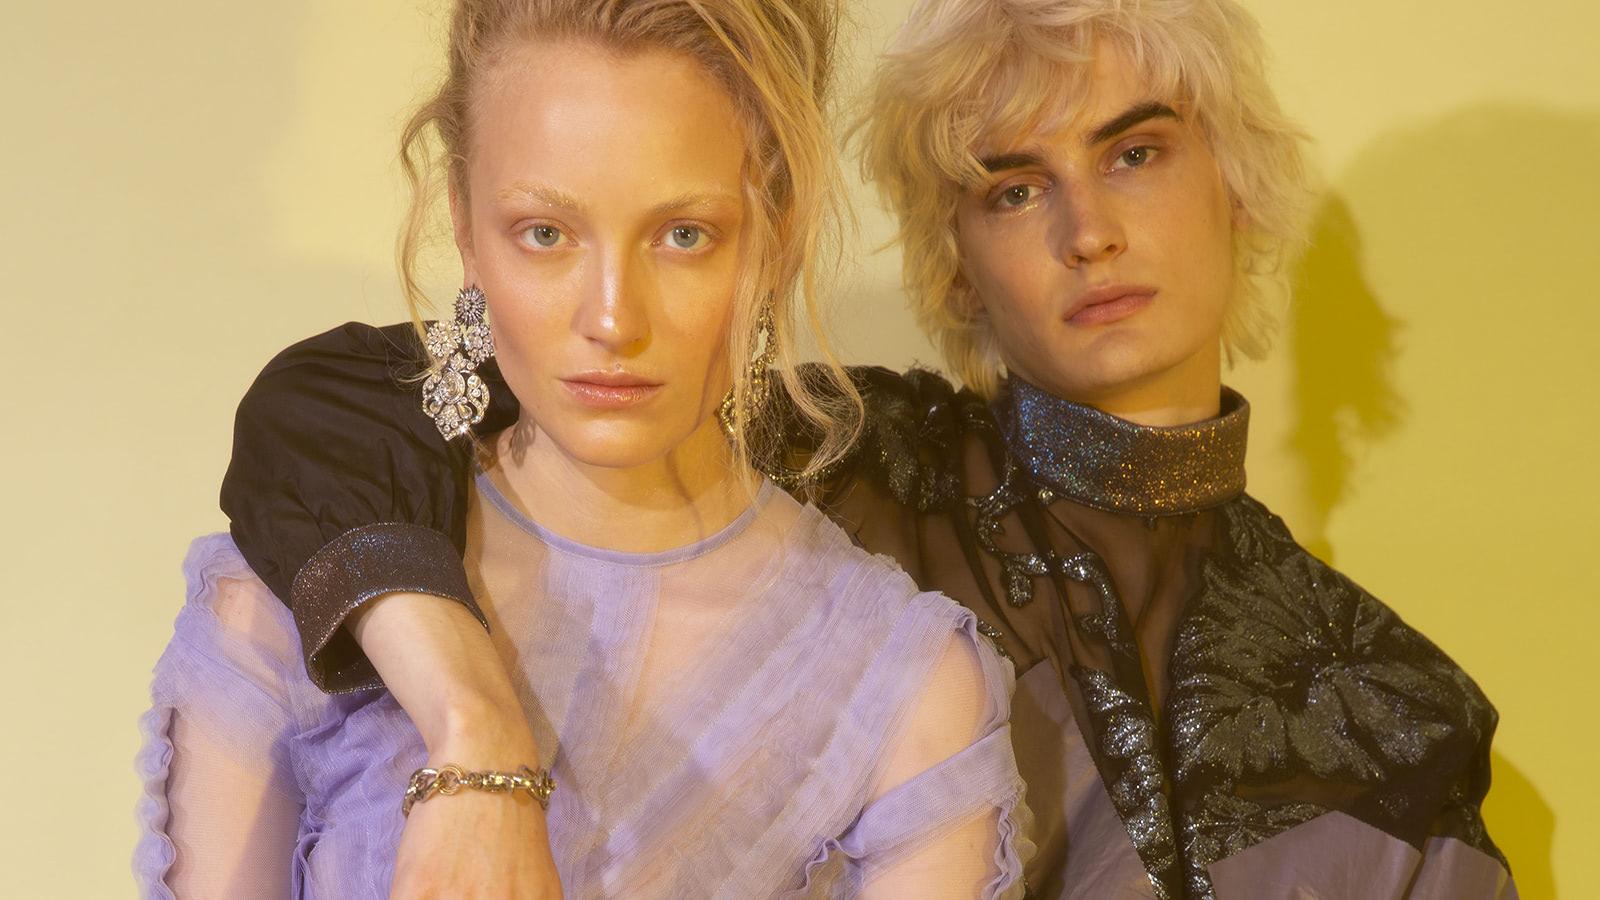 Avocational level course in Fashion Image & Styling – Курс по имиджу и стайлингу (3 недели) в США